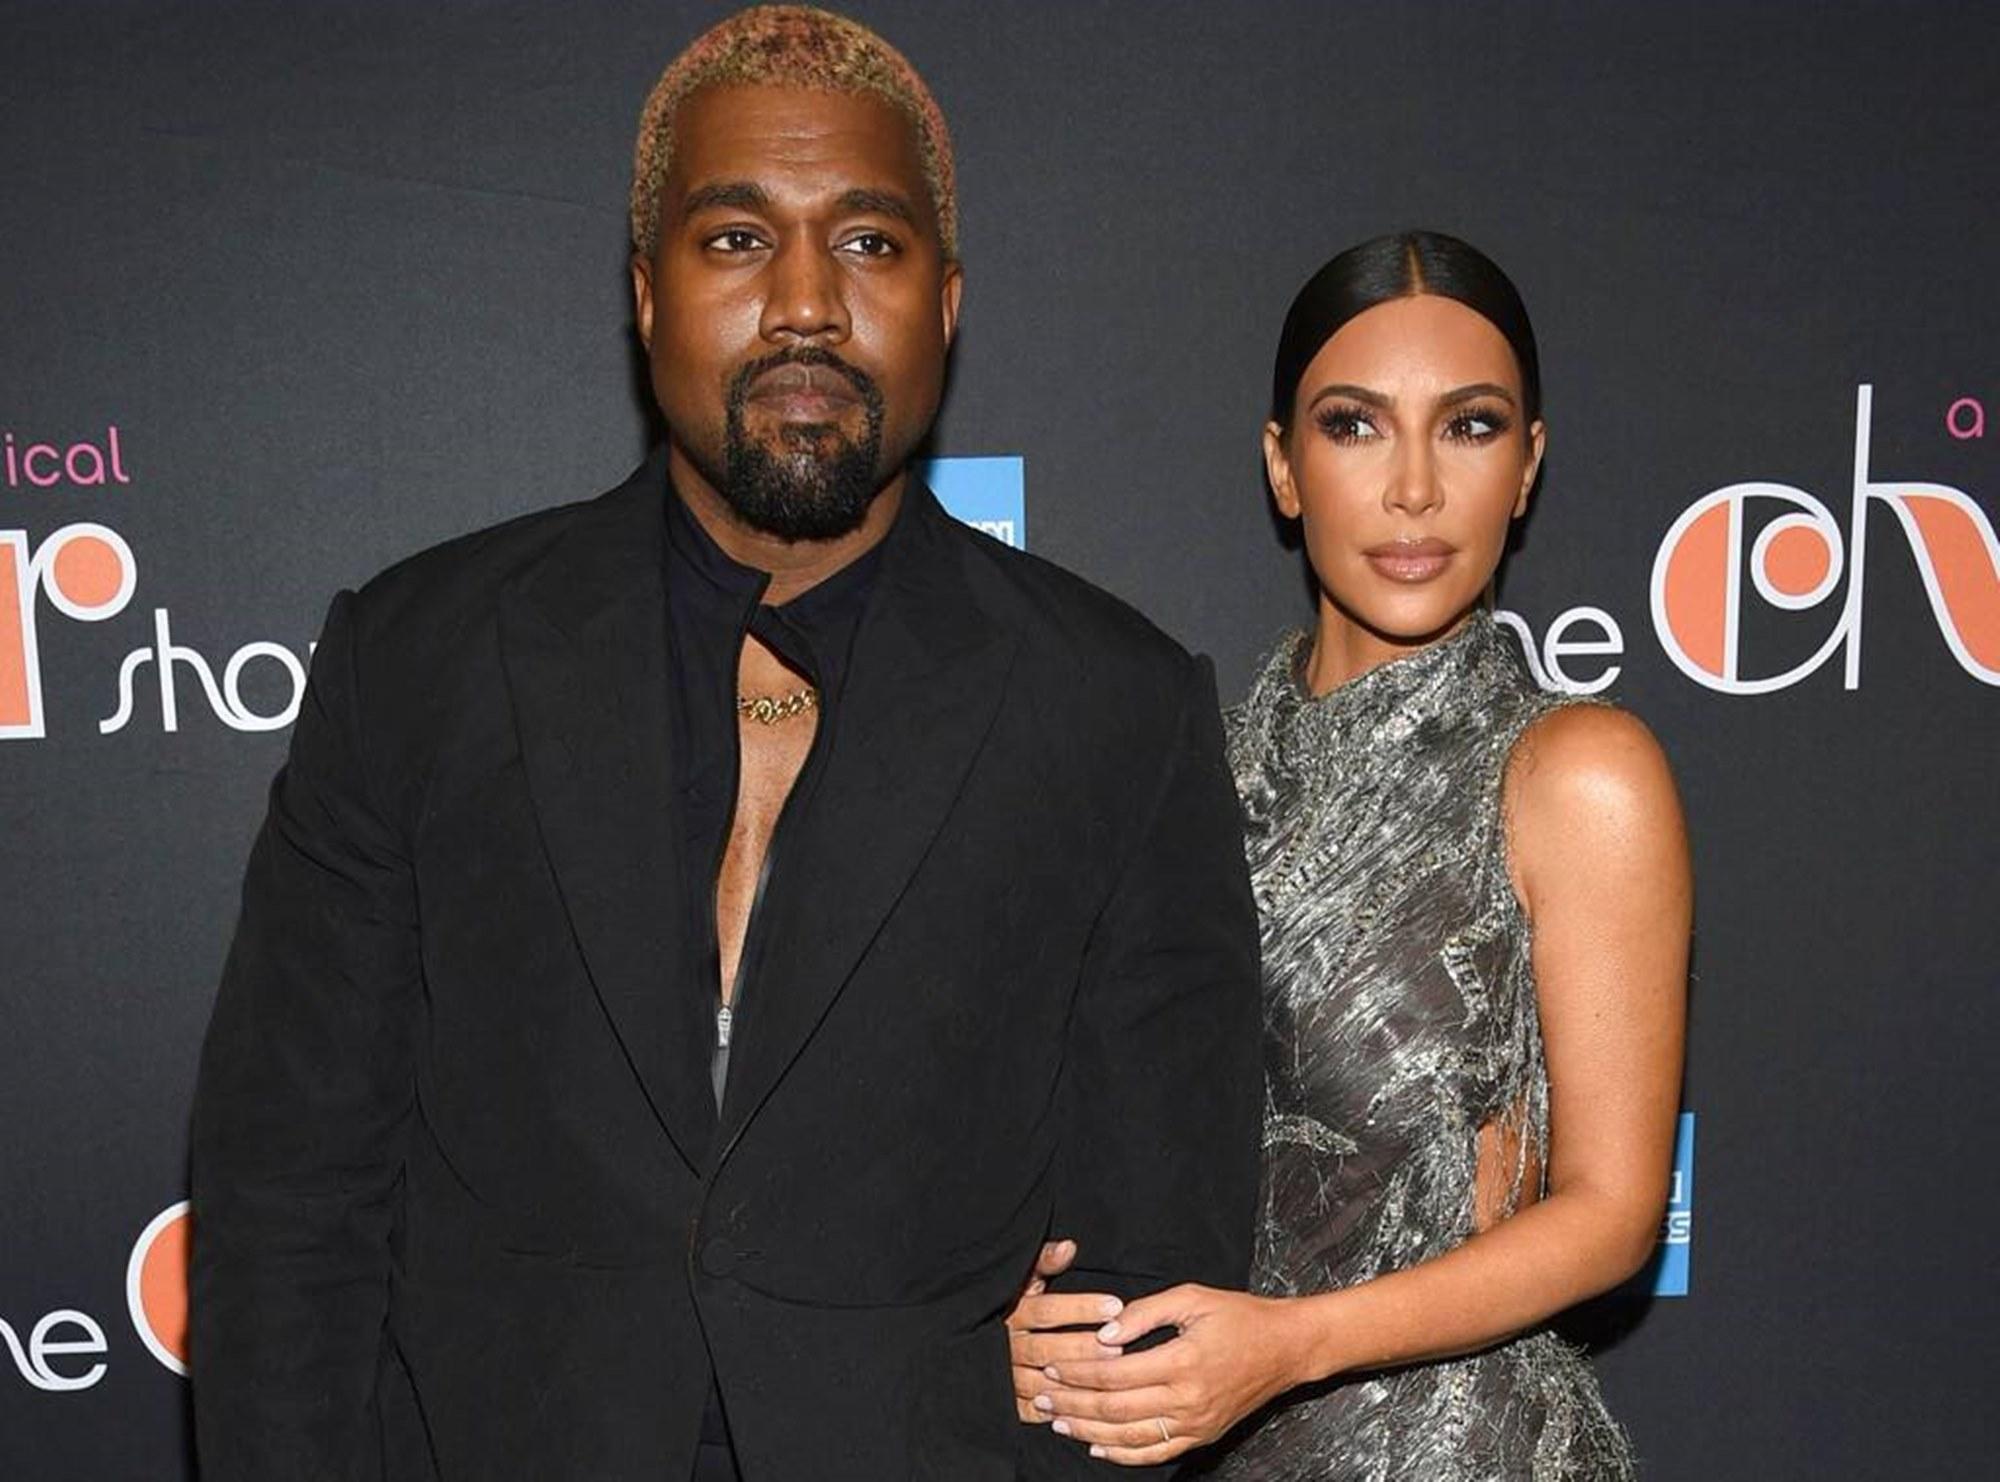 Kanye West Kim Kardashian Bi-Polar Statement